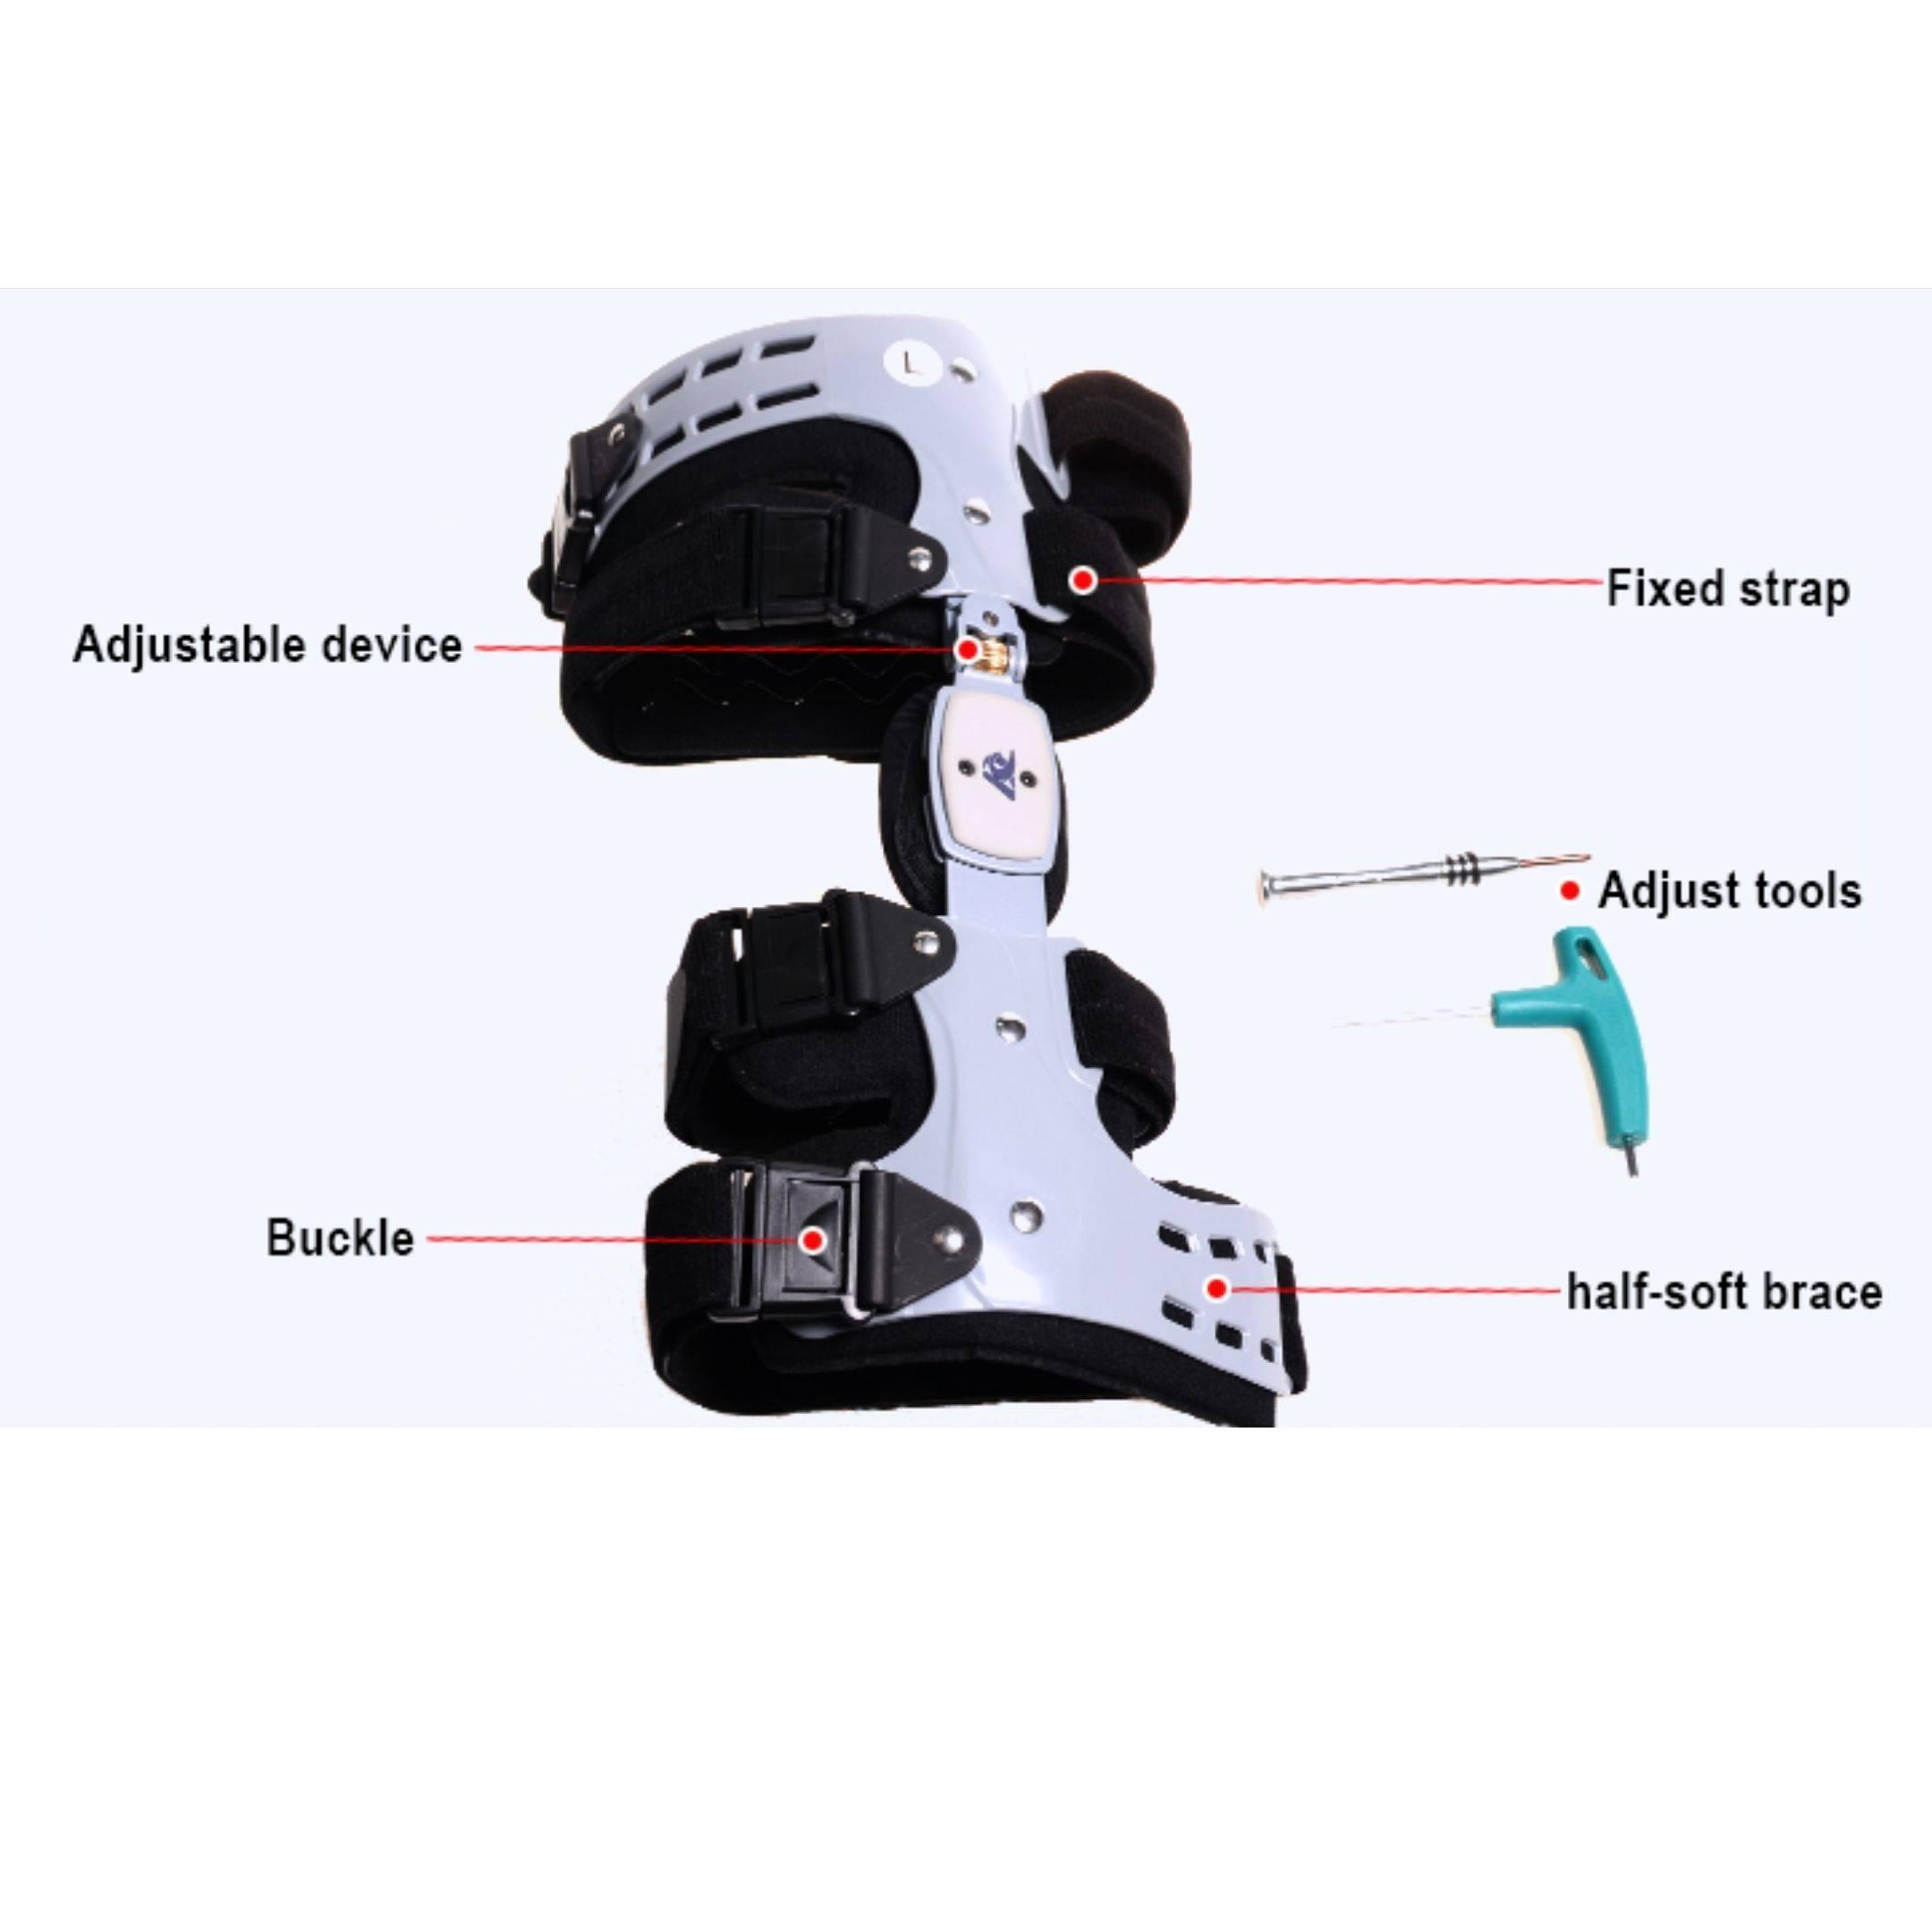 comfyorthopedic oa unloader knee brace includes adjustment tools, fixed starps, buckle, suspension sleeve and 13 hinge stops